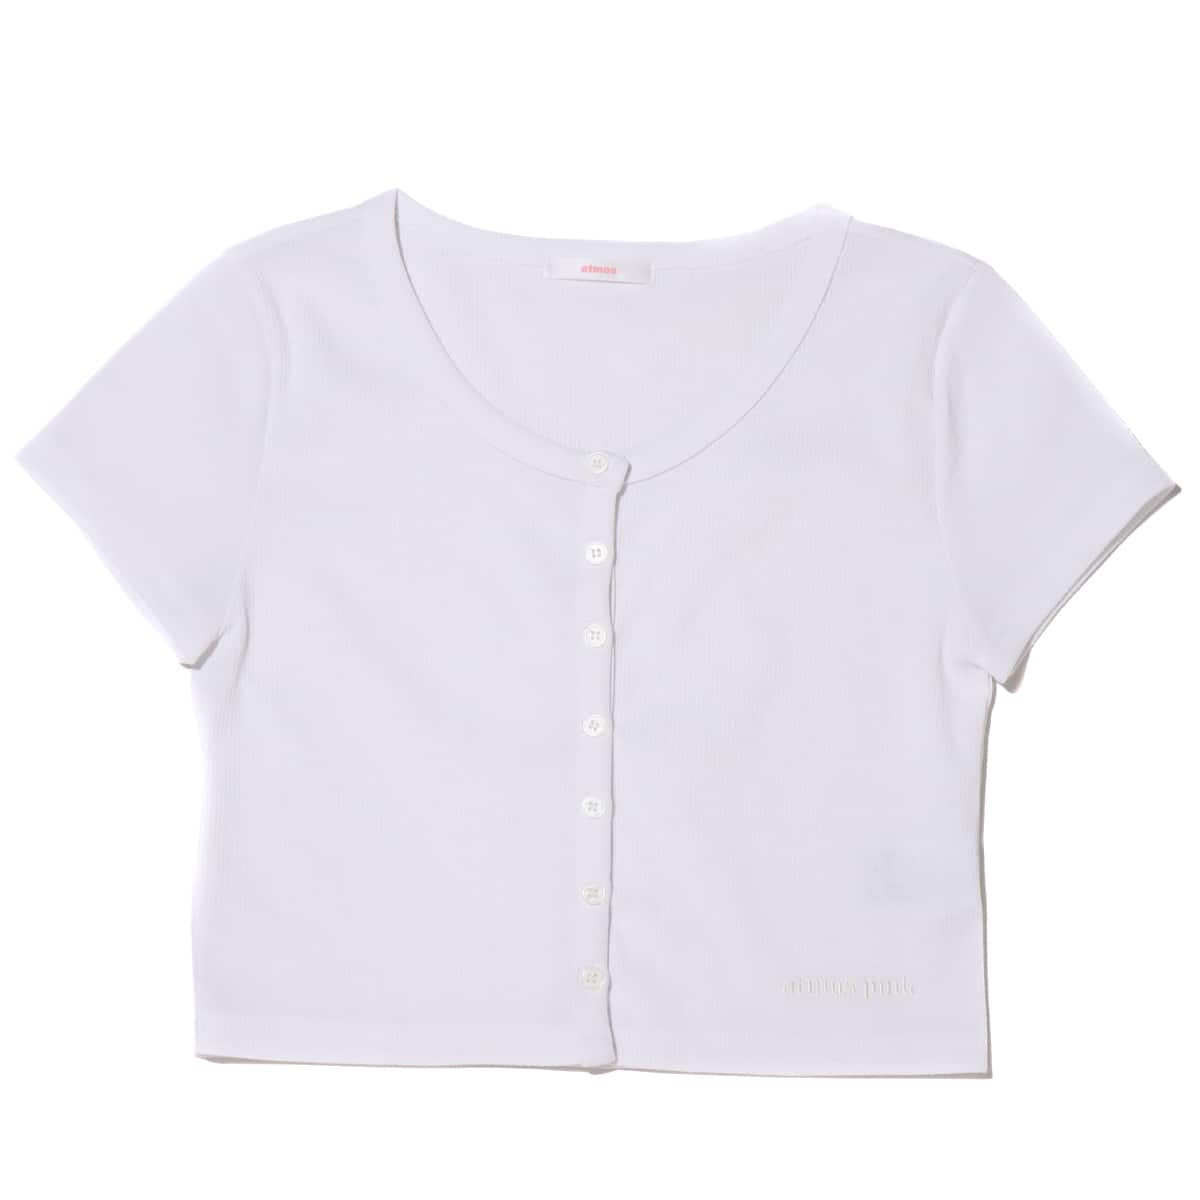 atmos pink ロゴ刺繍 ミニマル リブカーデ WHITE 21SP-I_photo_large